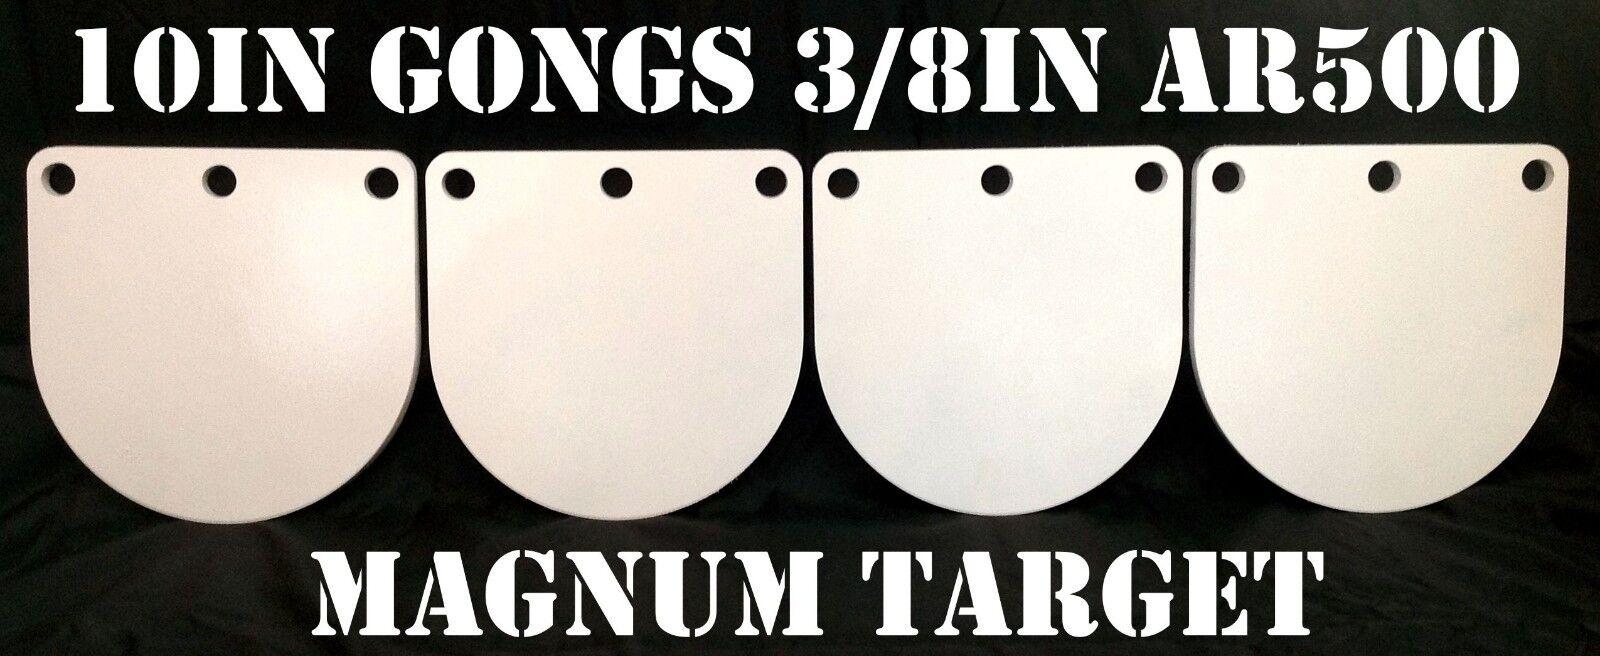 10 in (approx. 25.40 cm) 3 8  AR500 de acero endurecido Metal gongs-campo de tiro objetivos de pistola NRA